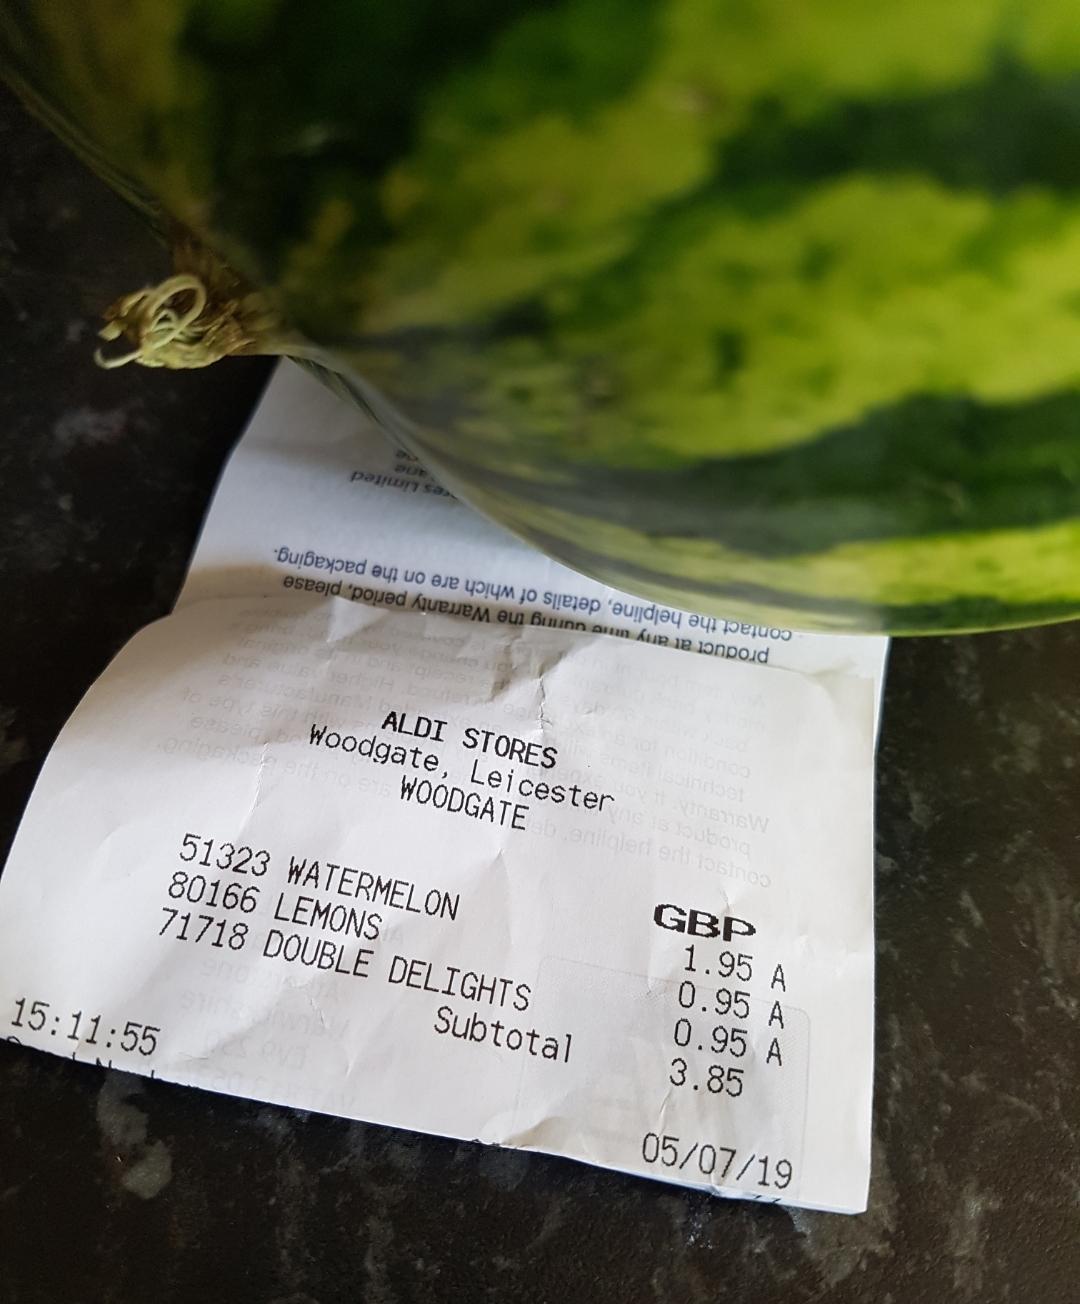 Whole Watermelon £1 95 @Aldi - hotukdeals